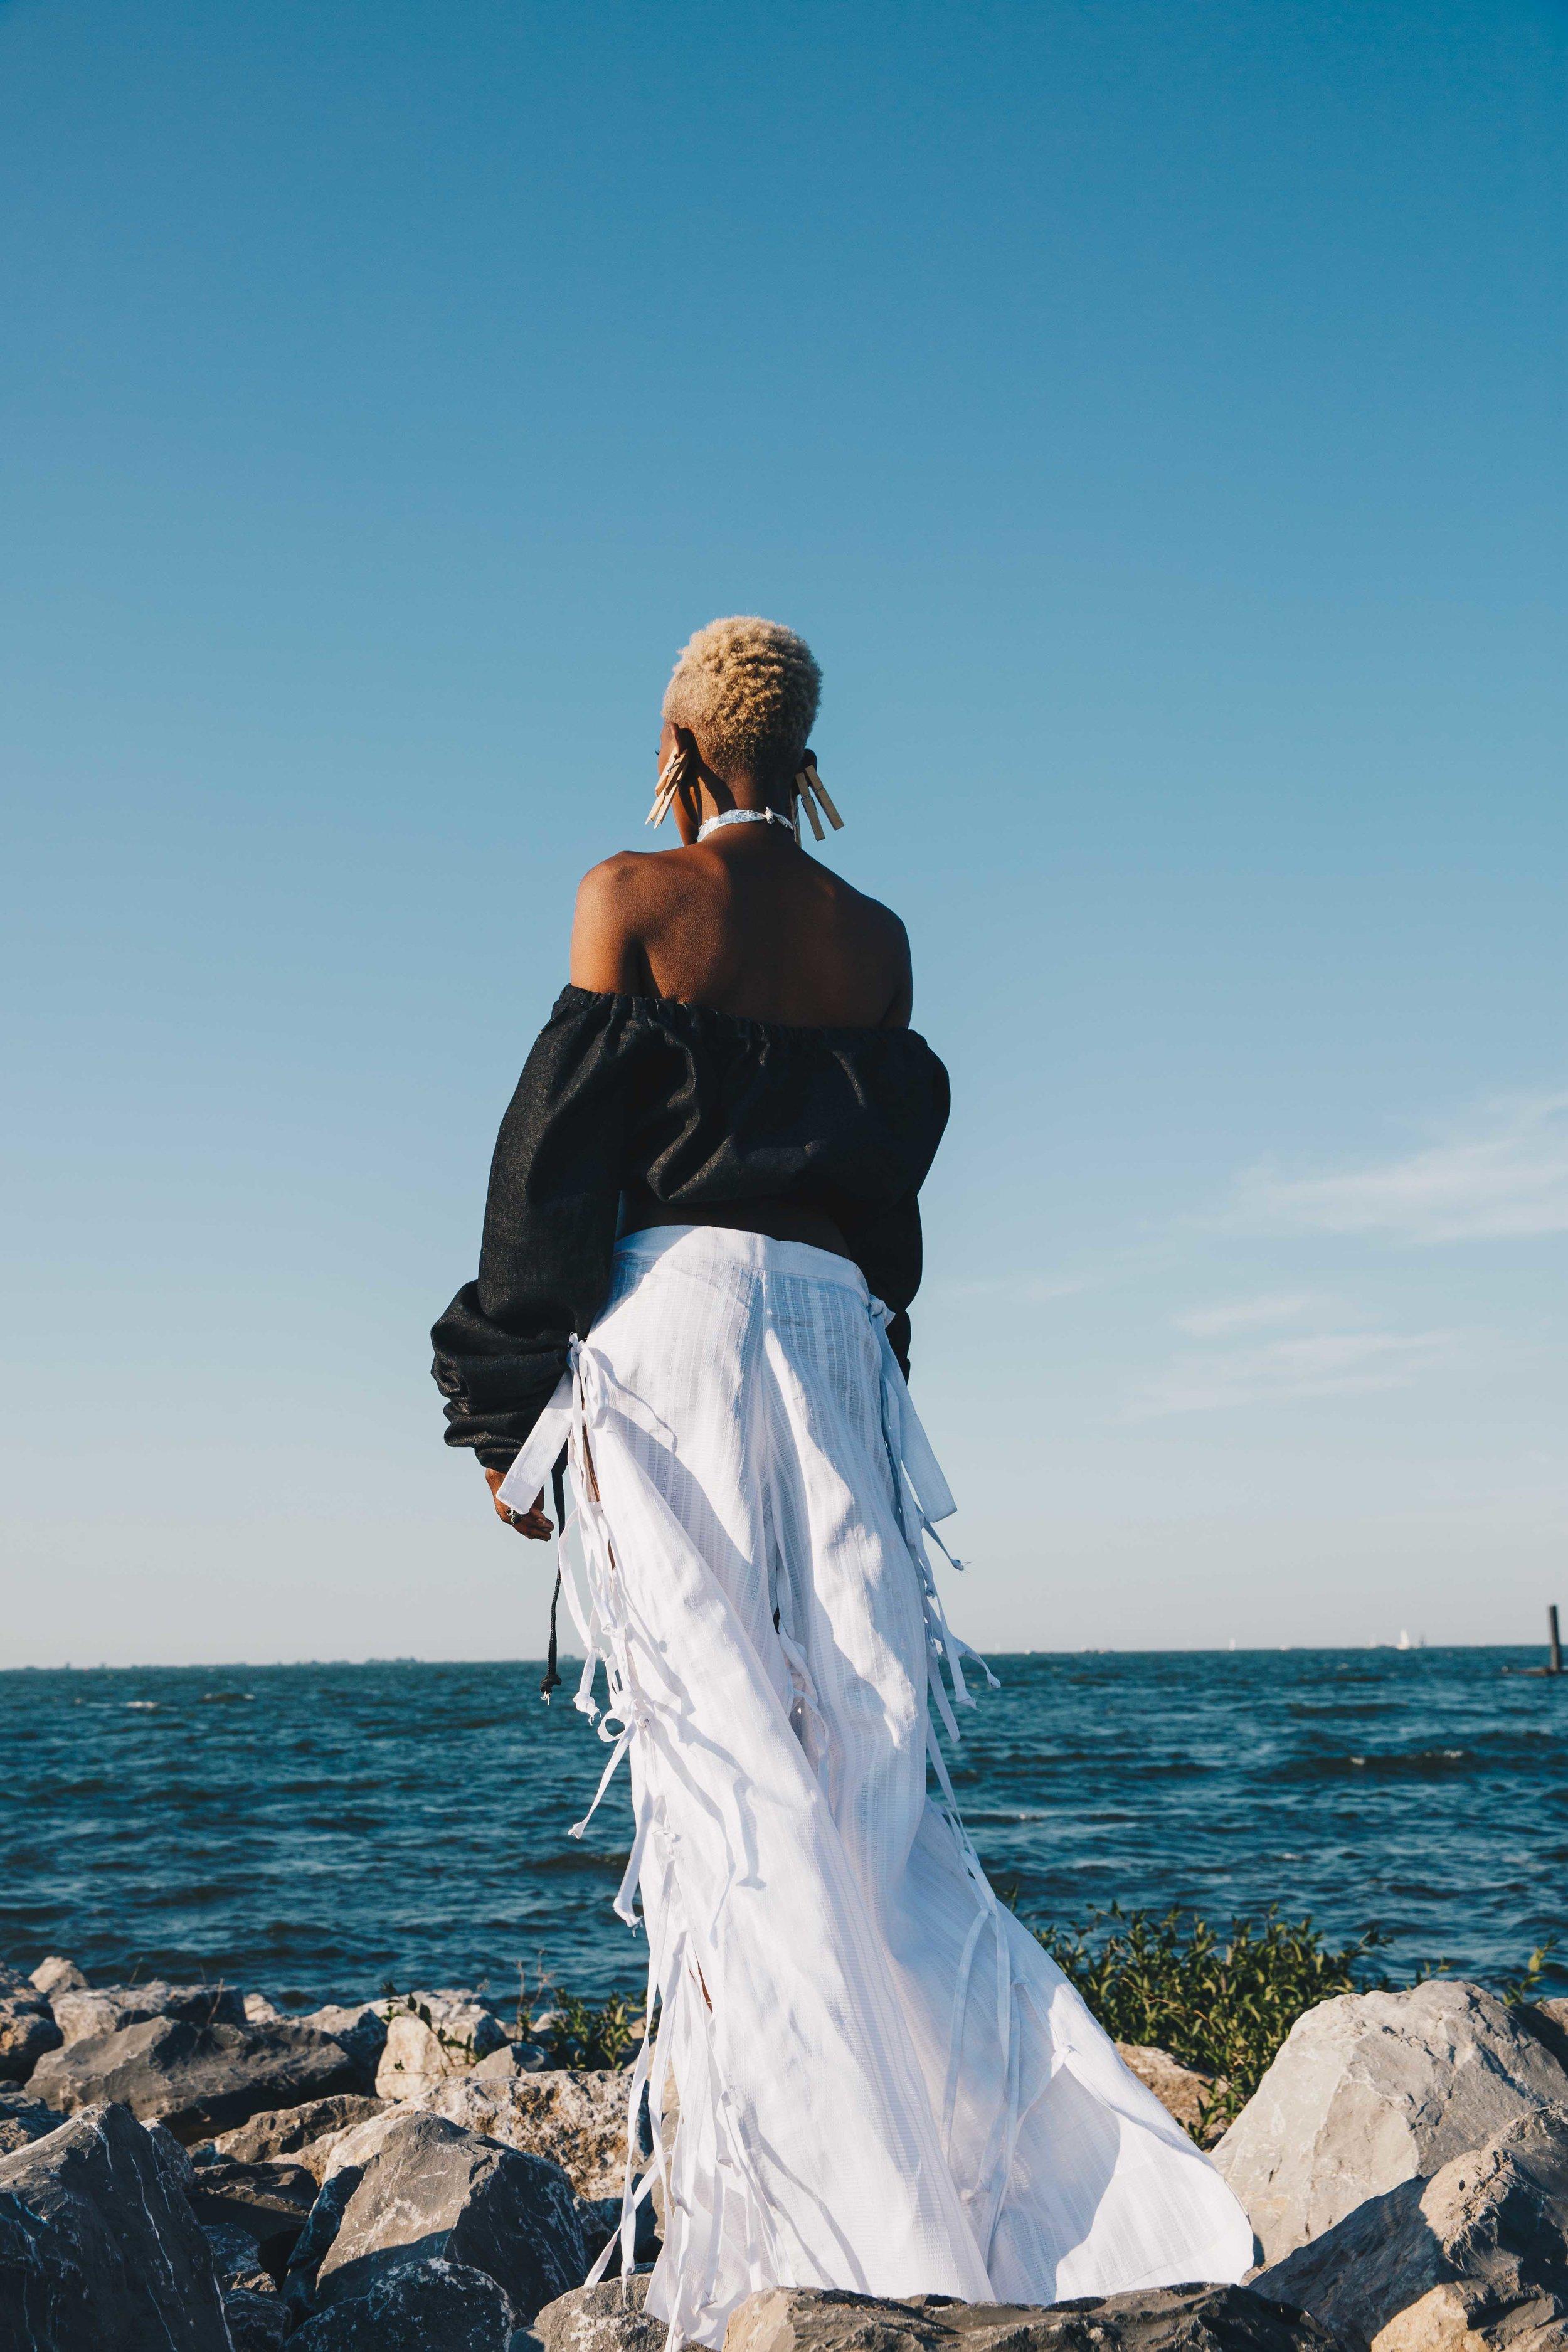 SS18 shoot for Nigerian fashion designer Bubu Ogisi, I.AM.ISIGO